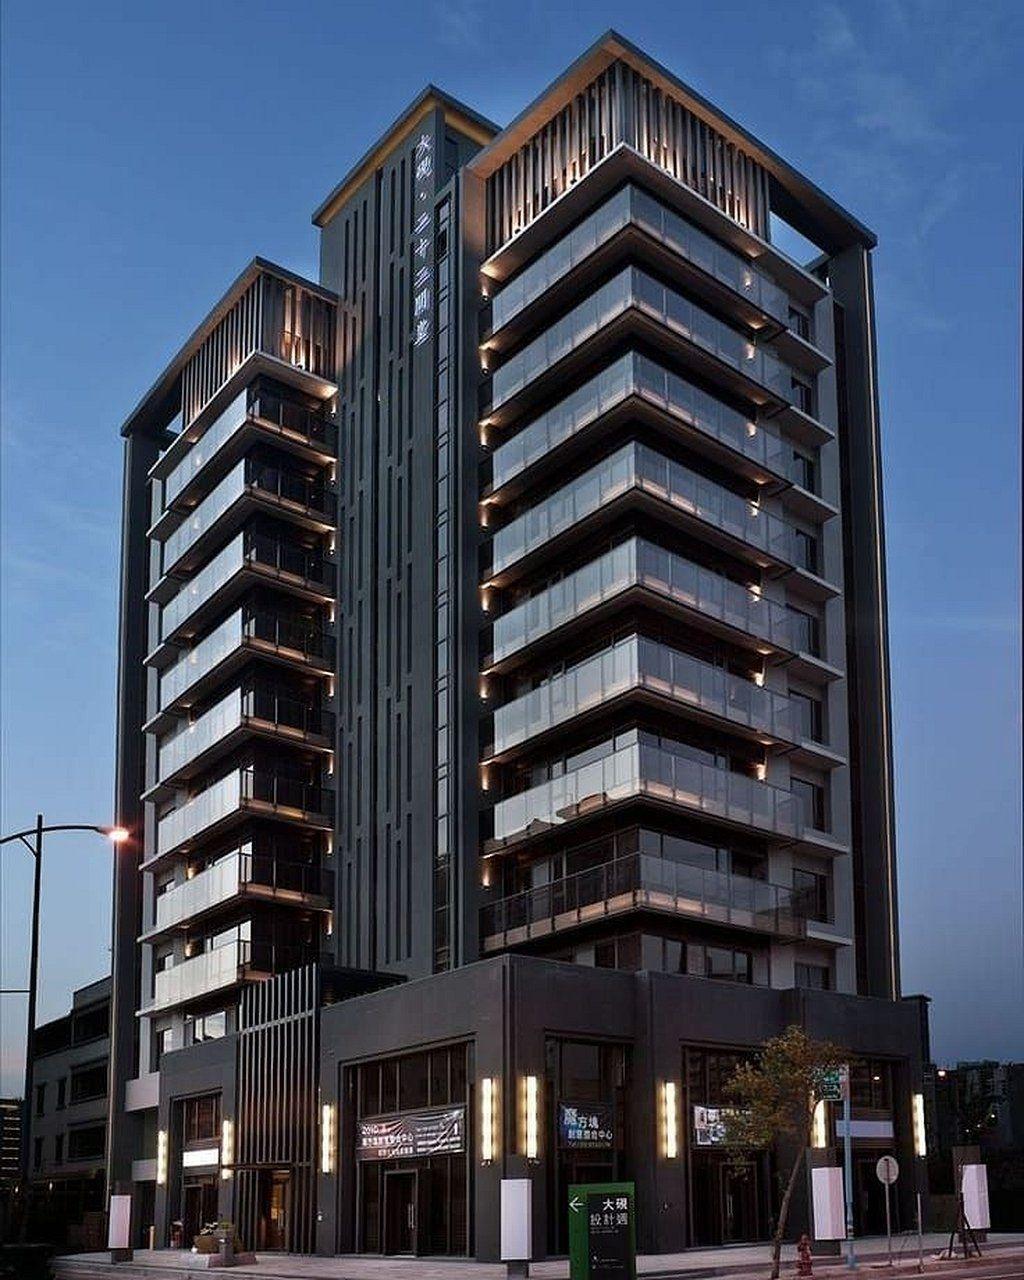 Carports For Apartment Buildings: 59 Hotels Design Architecture Buildings Https://www